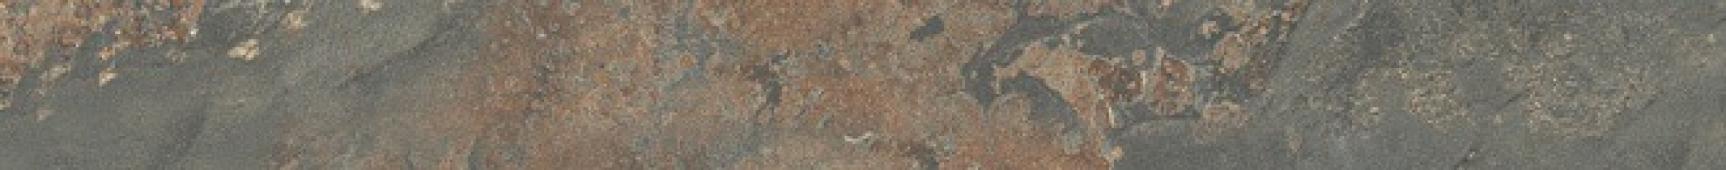 Бордюр Рамбла коричневый обрезной 25х2,5х19